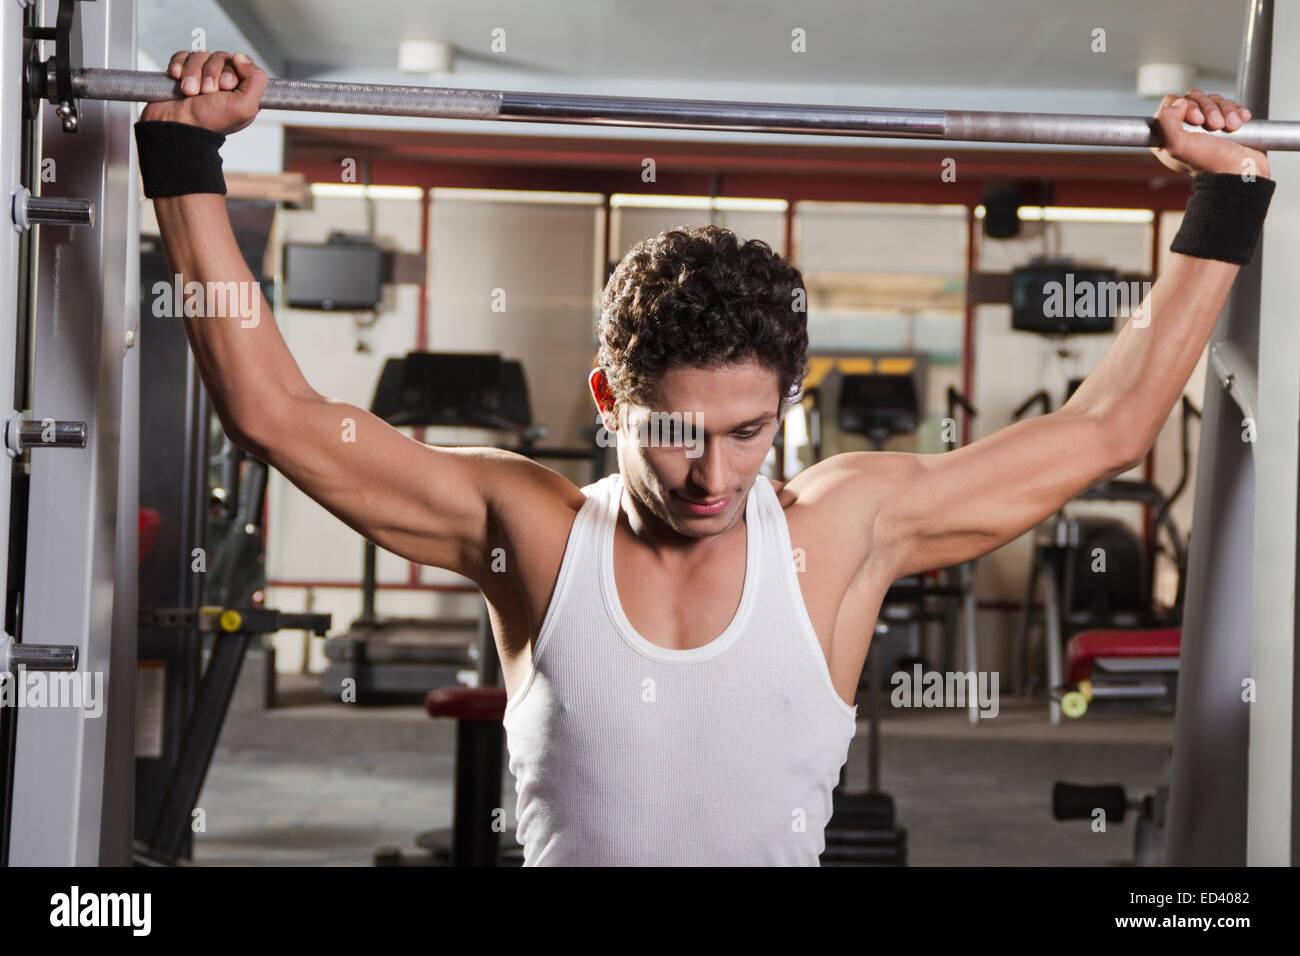 Indian man gym body building stock photo  alamy